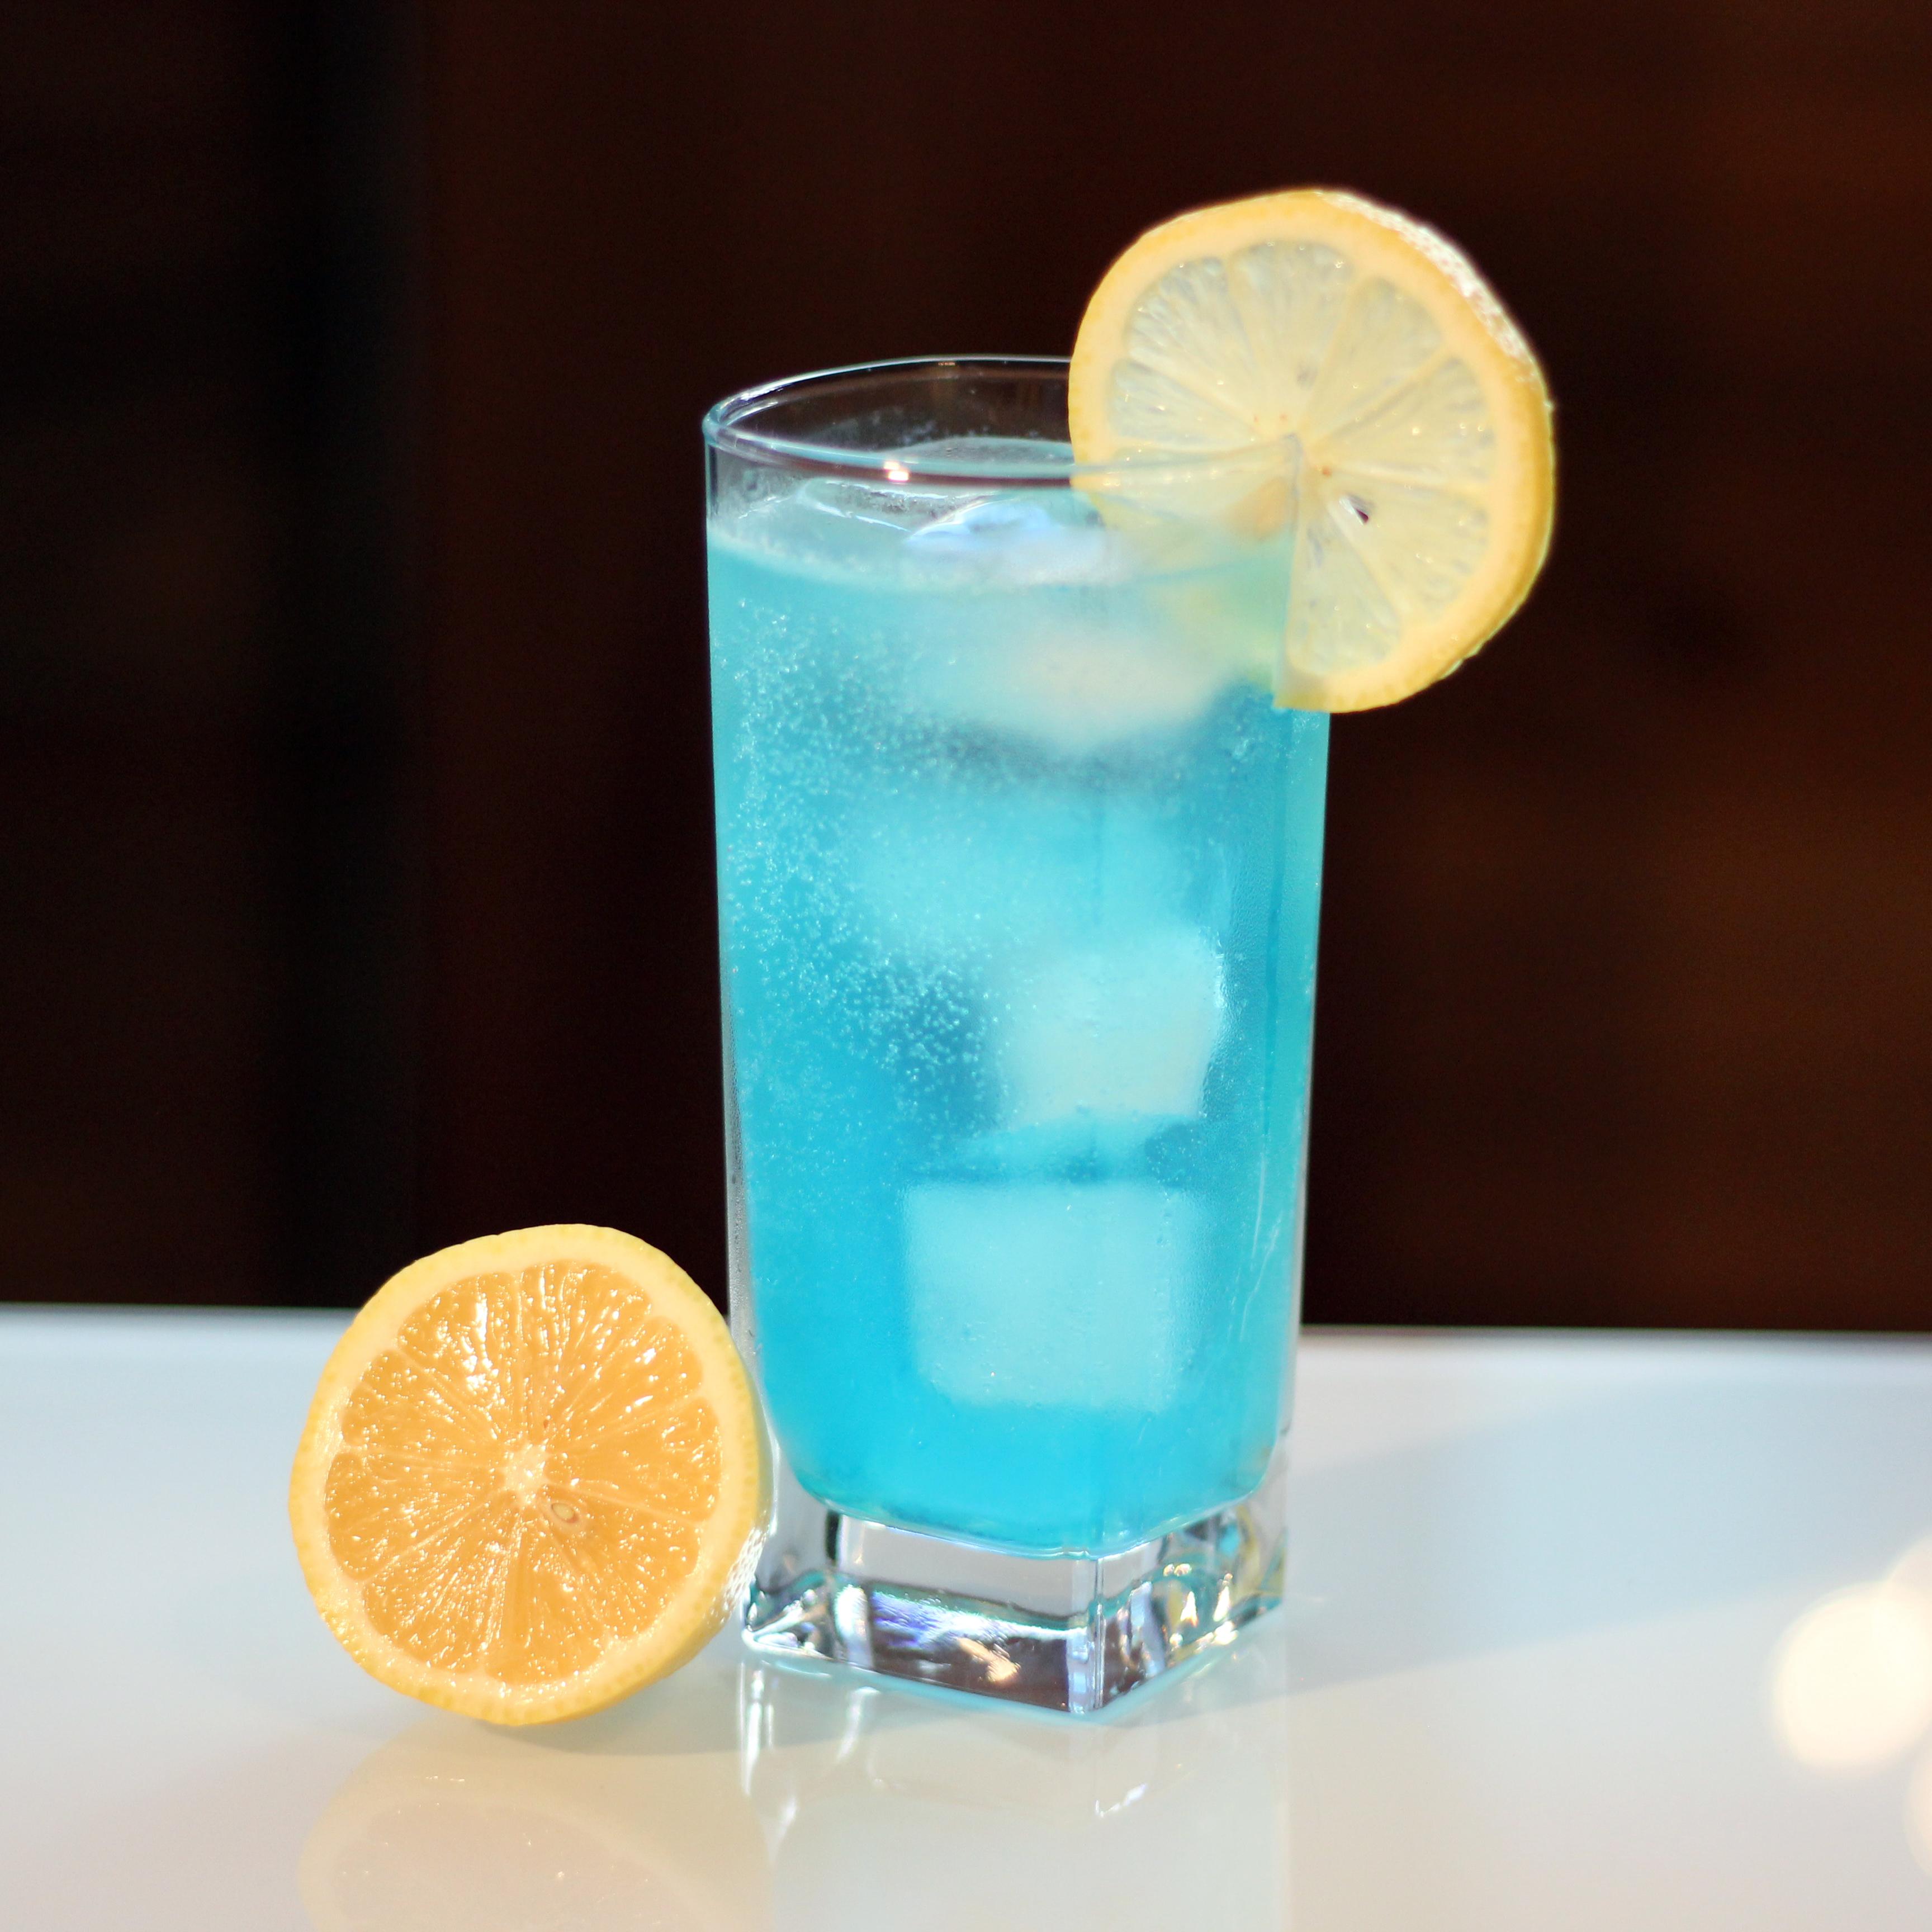 Inventor of long island iced tea for Iced tea cocktail recipes